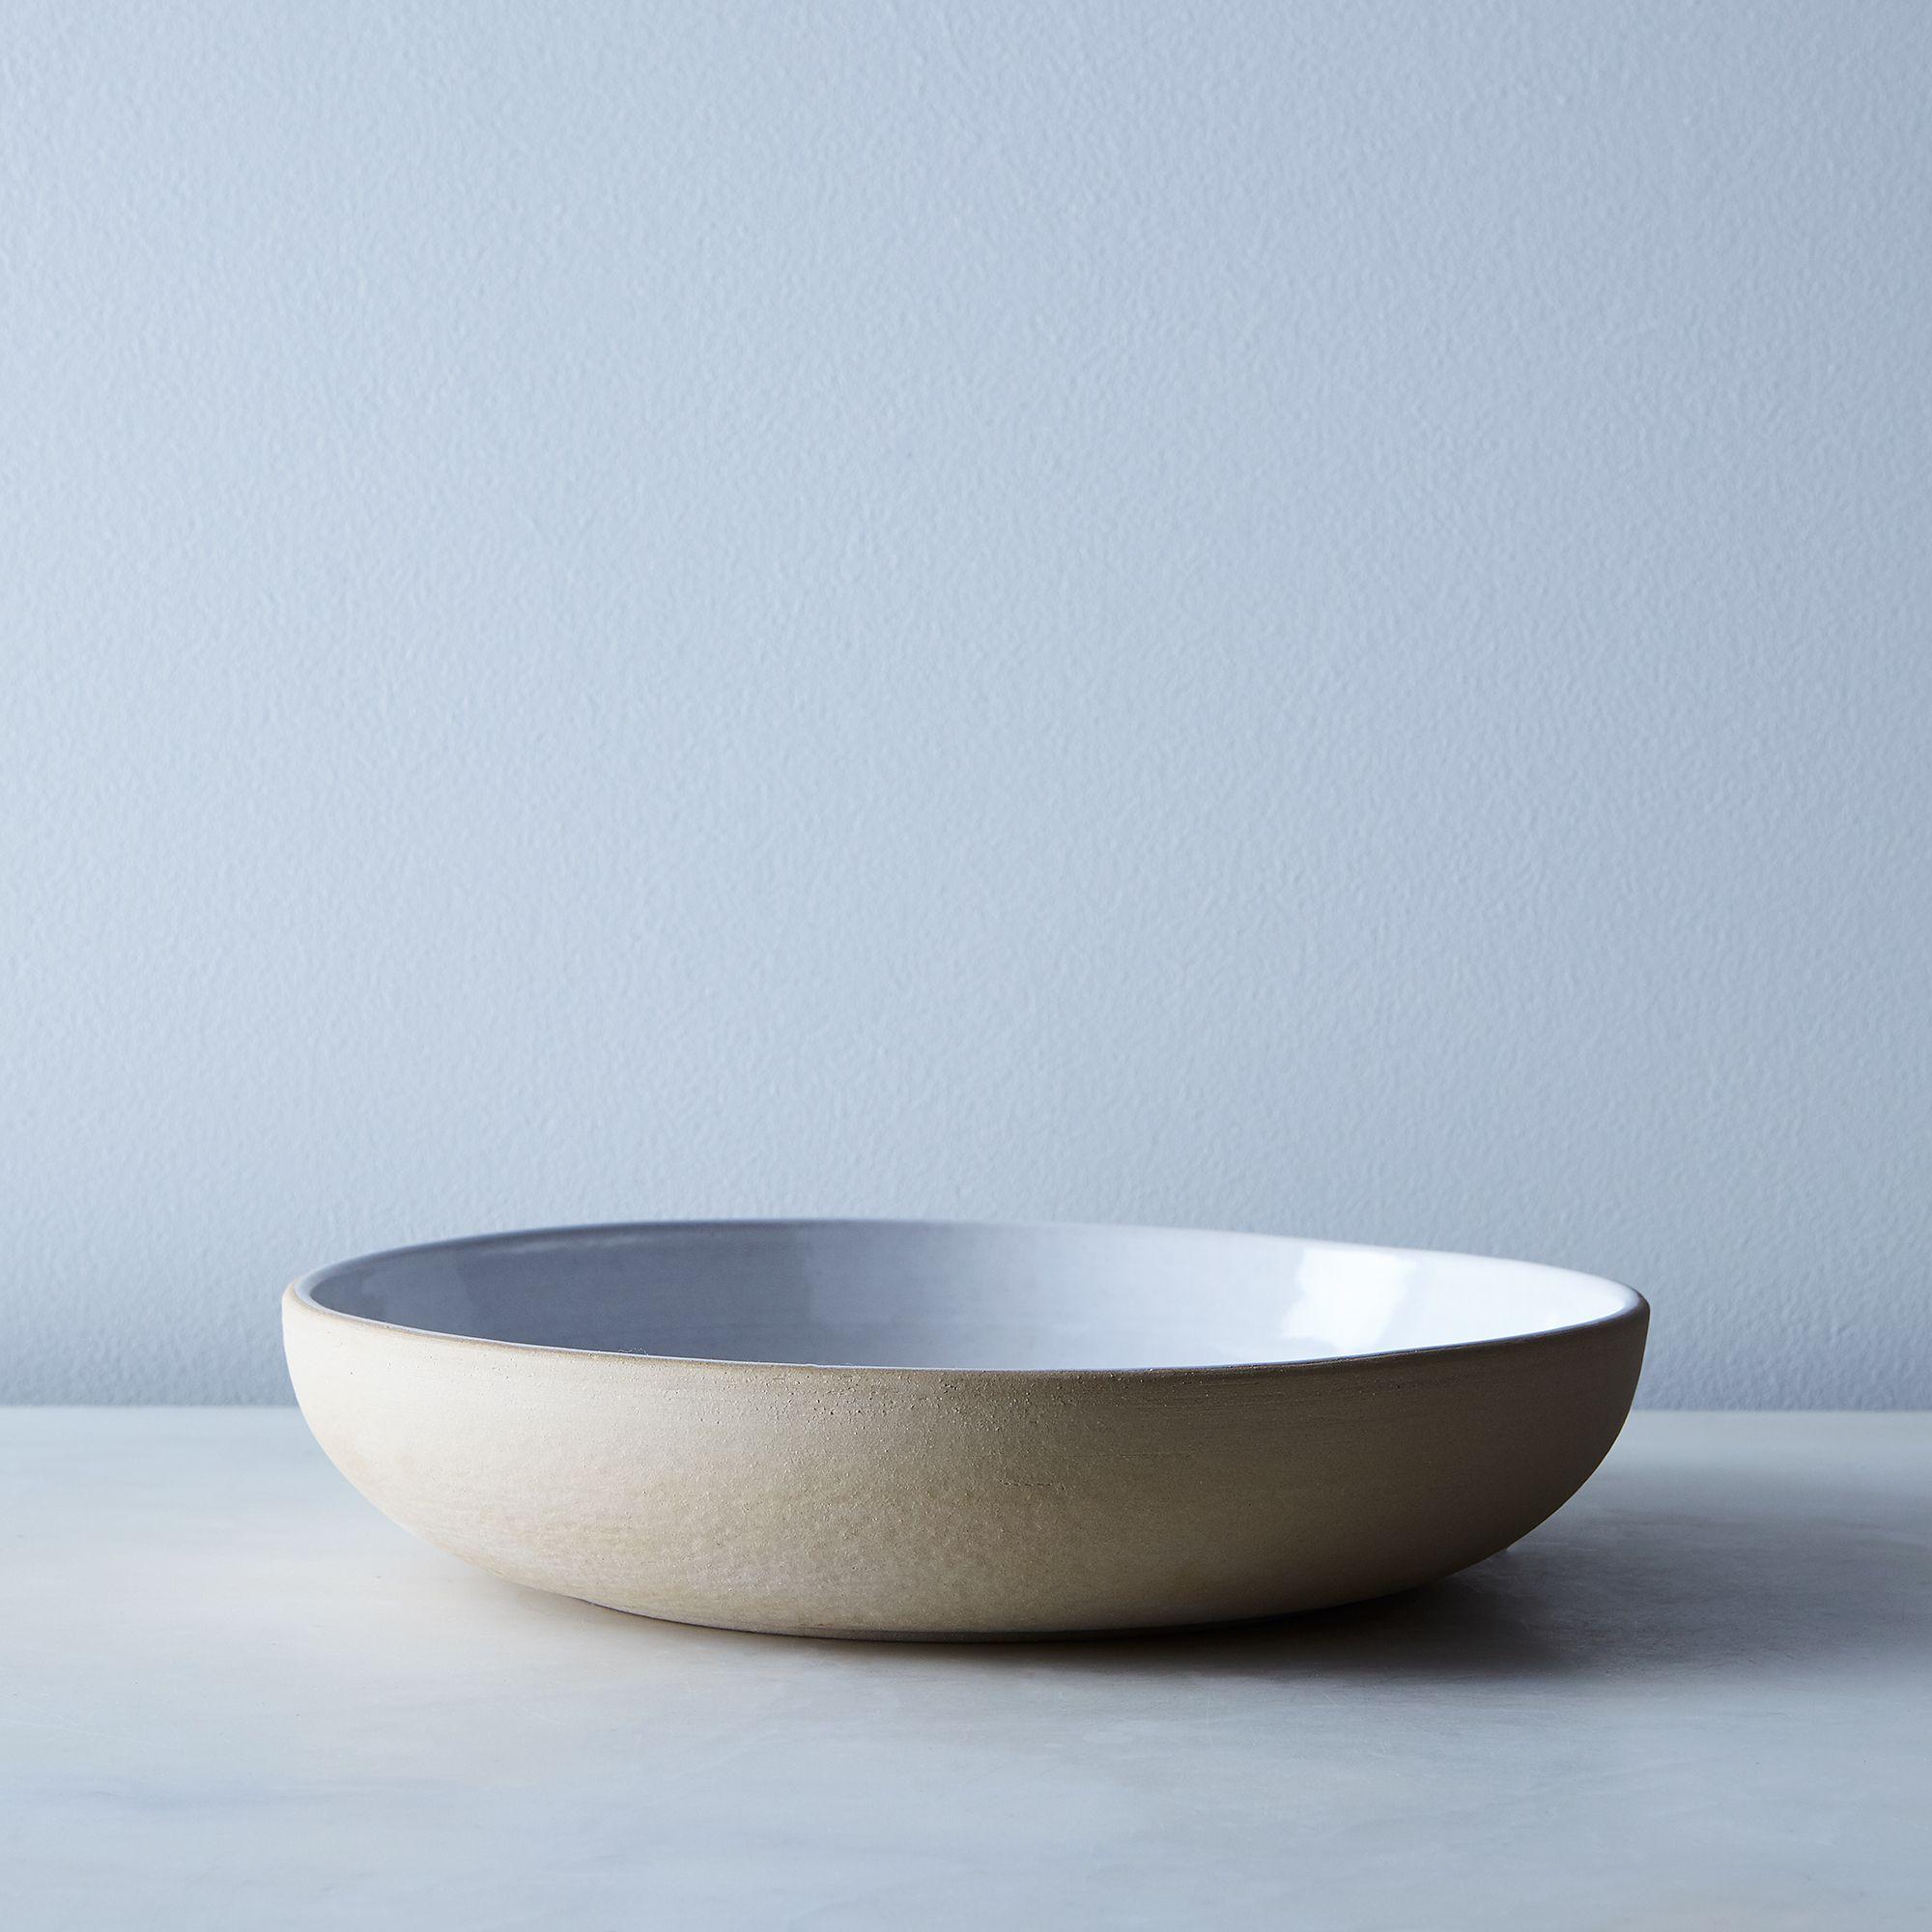 233580d1 7691 4490 8091 7b656676cfd4  2017 0516 food52 by jono pandolfi serving bowl silo rocky luten 002